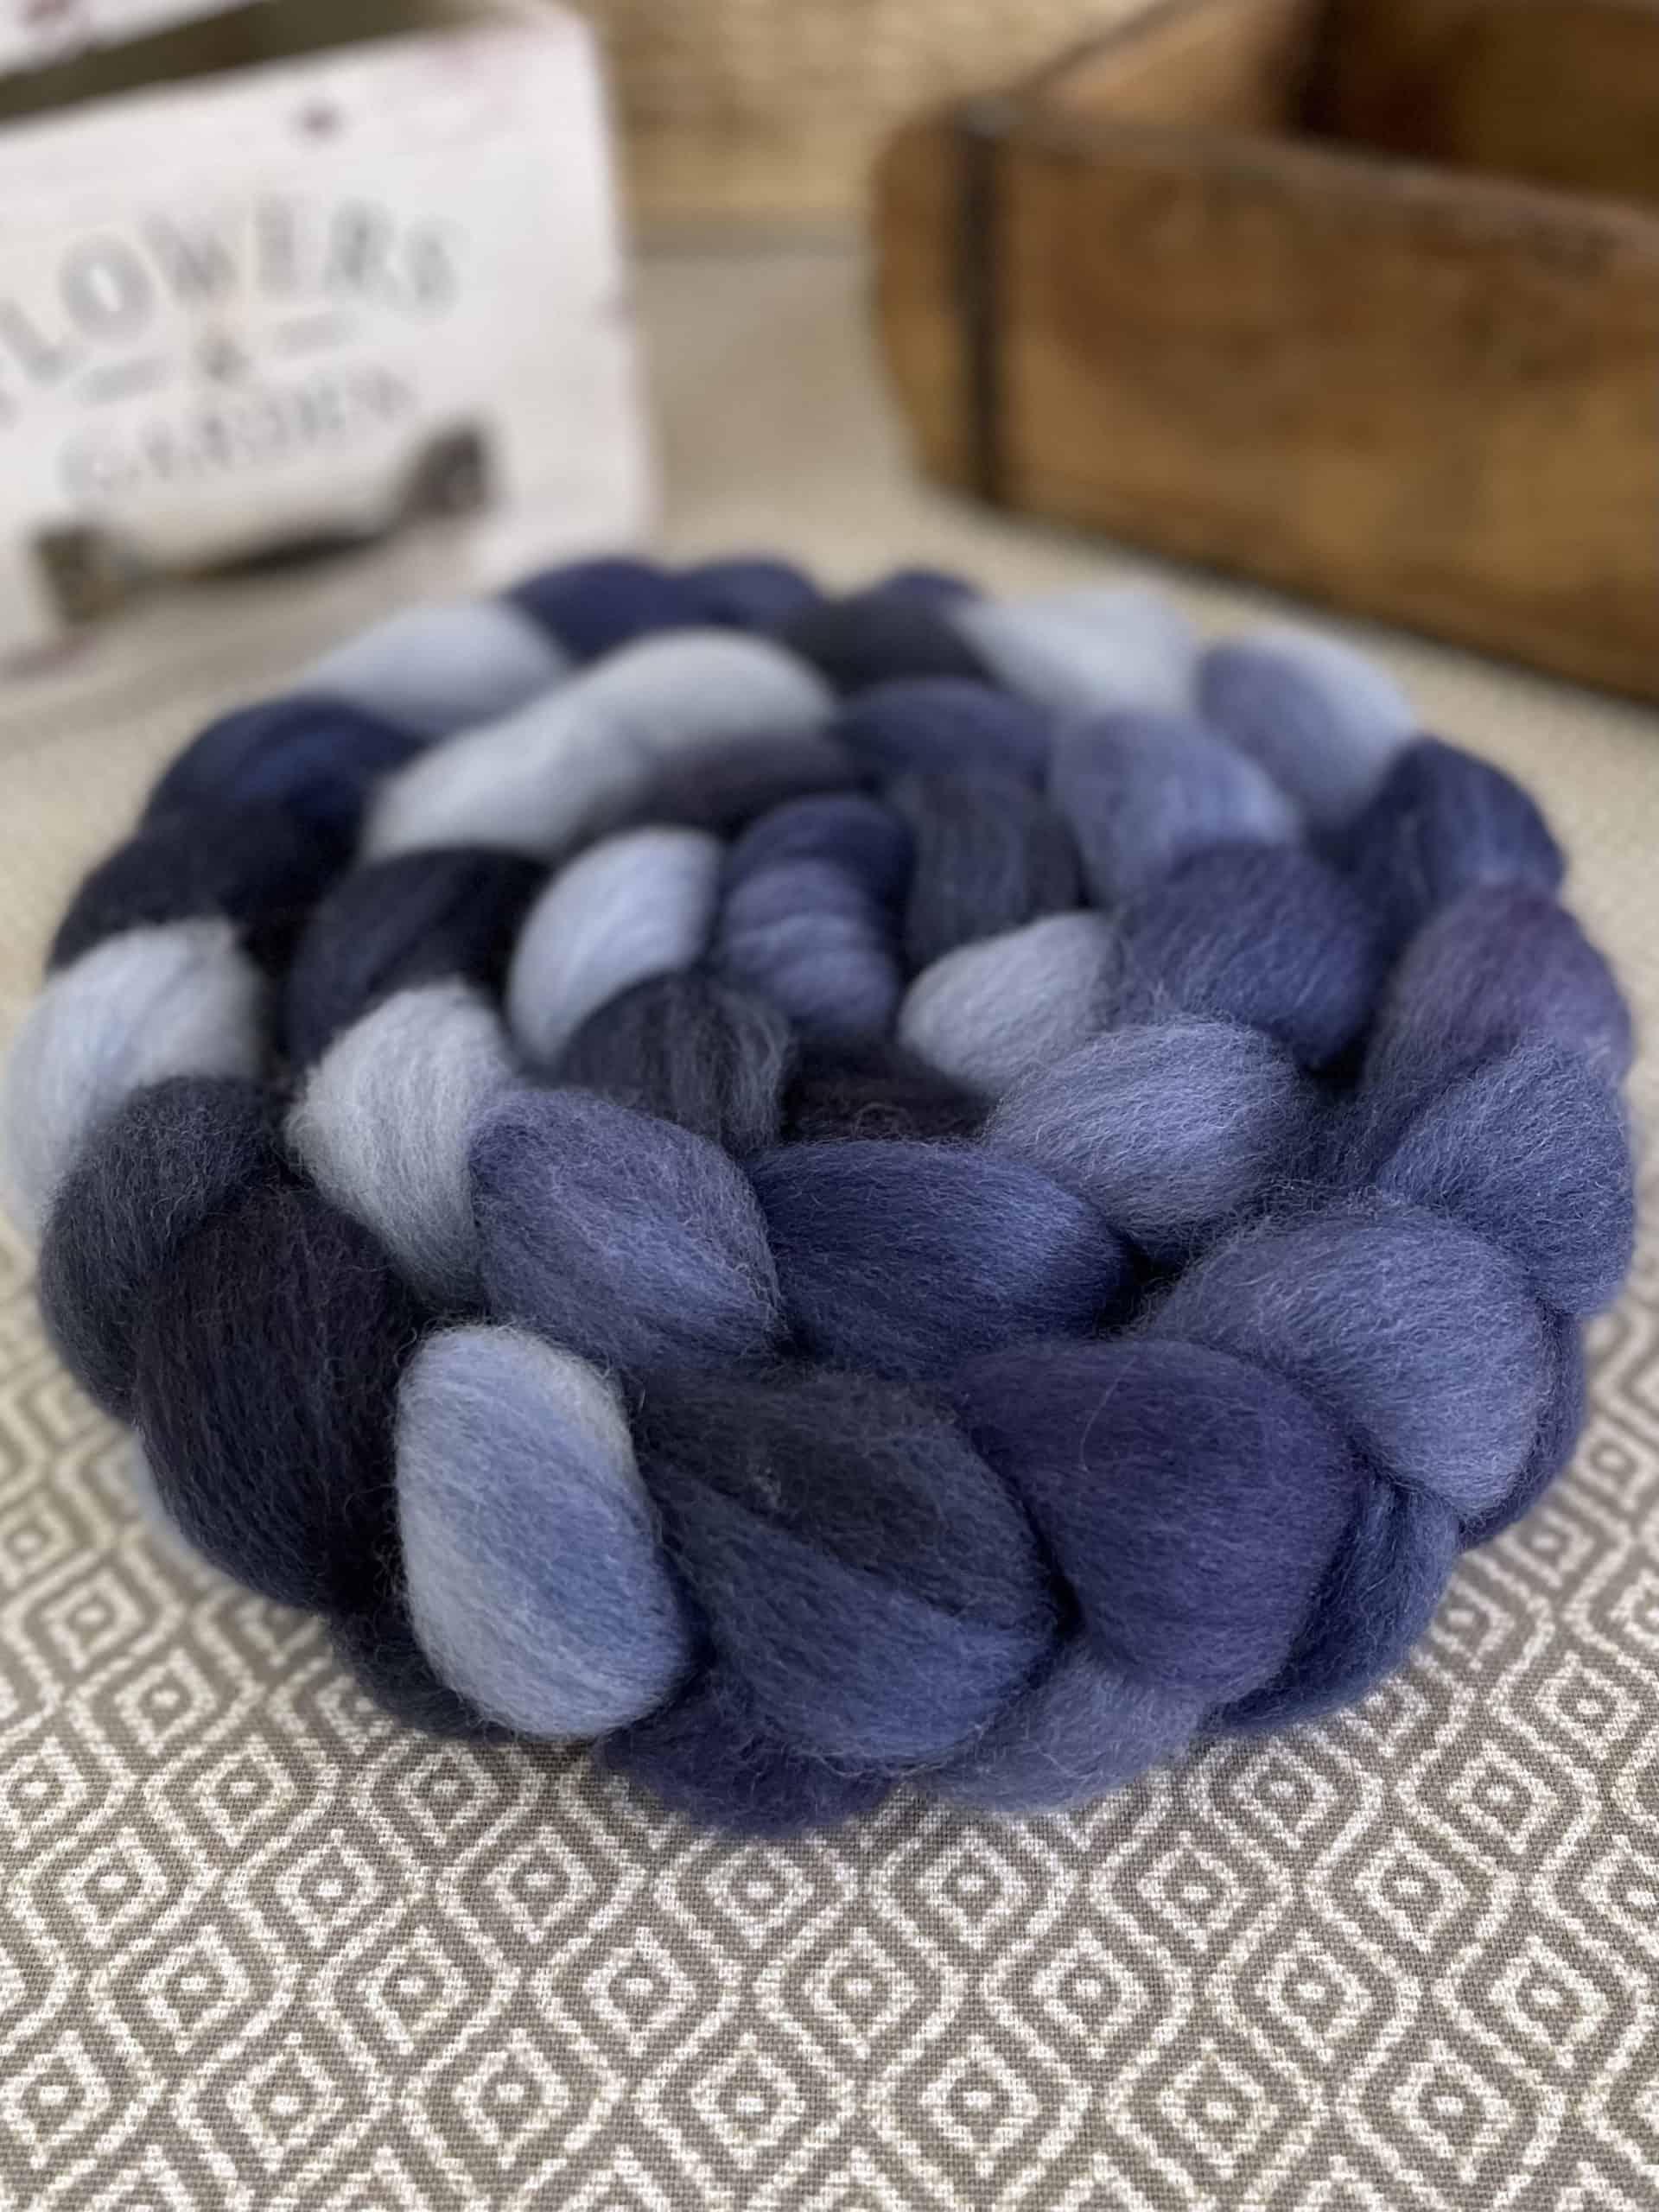 A braid of blue fiber.